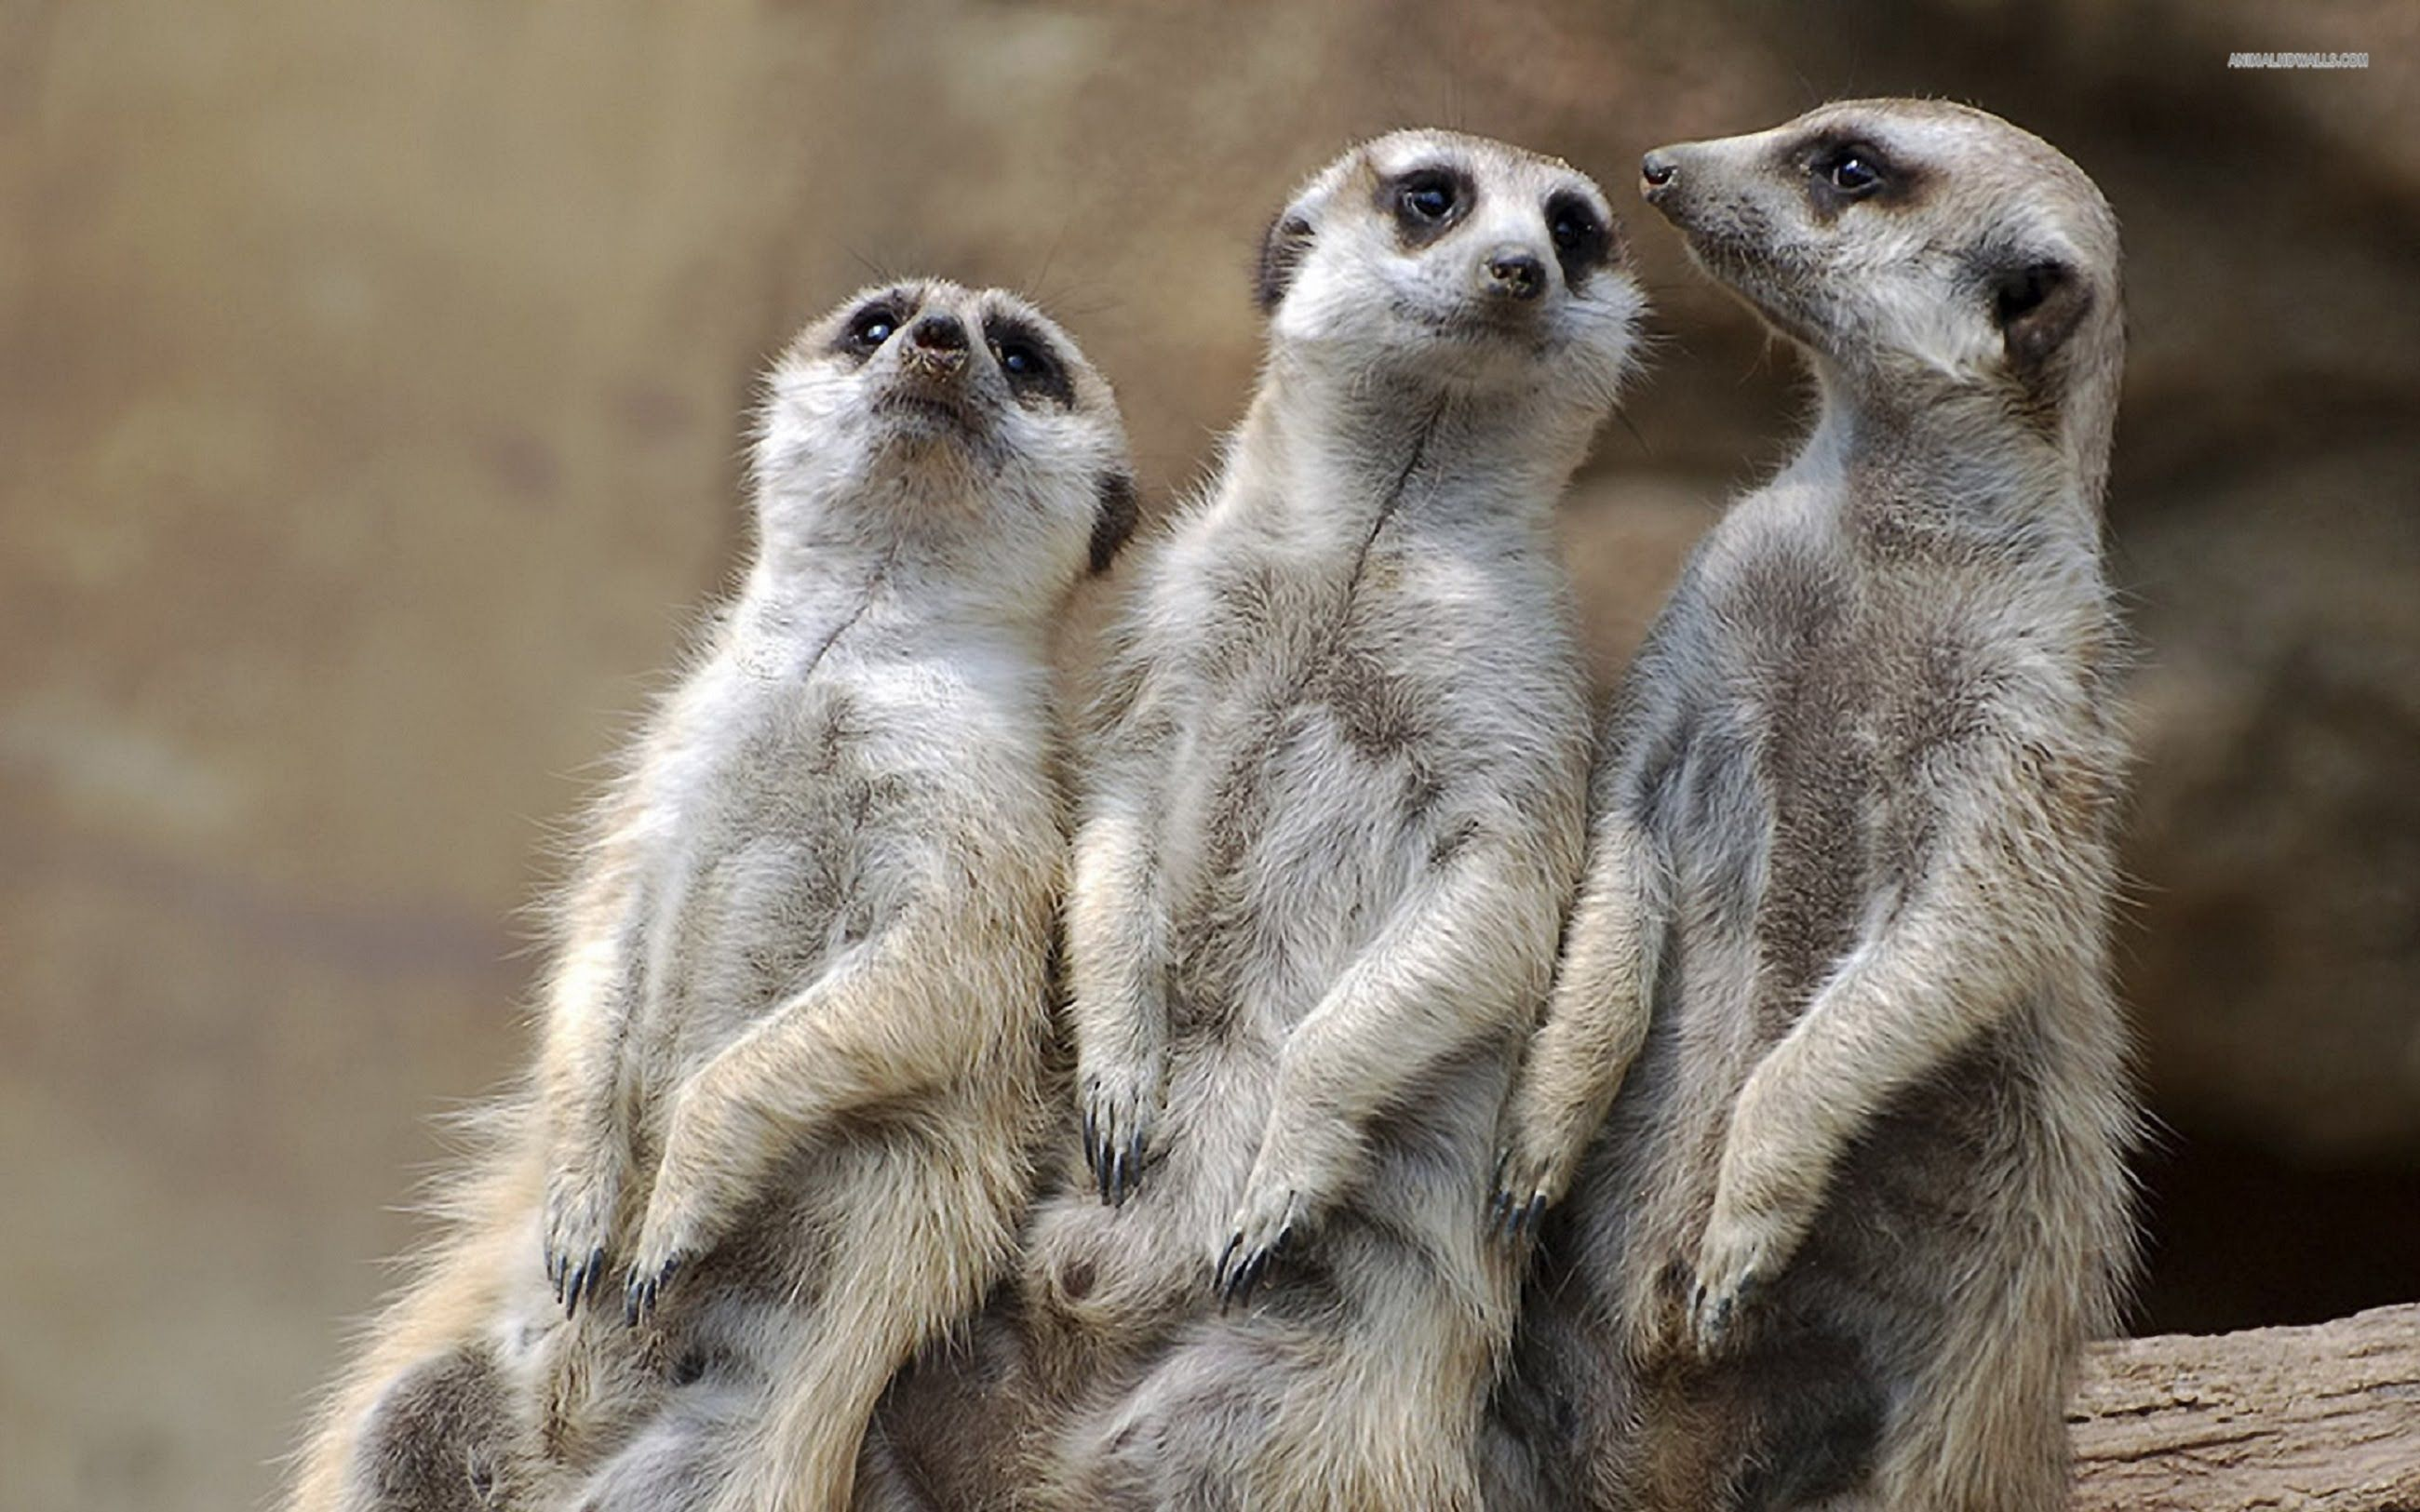 Meerkat Manor S01 E06 Boys Will Be Boys Meerkat, Funny